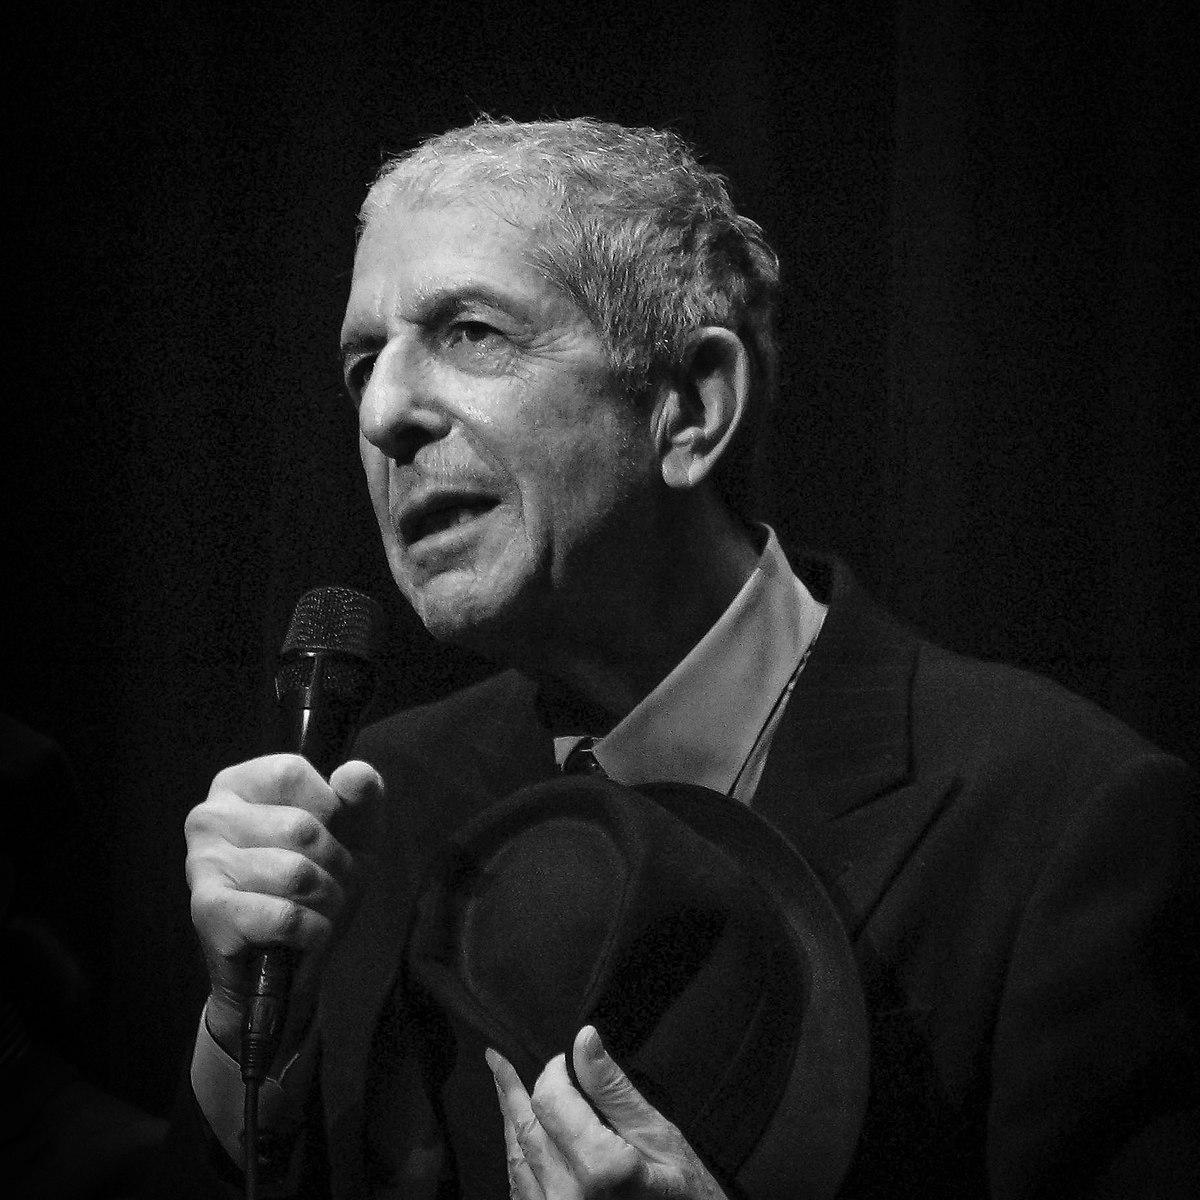 Cohen Leonard